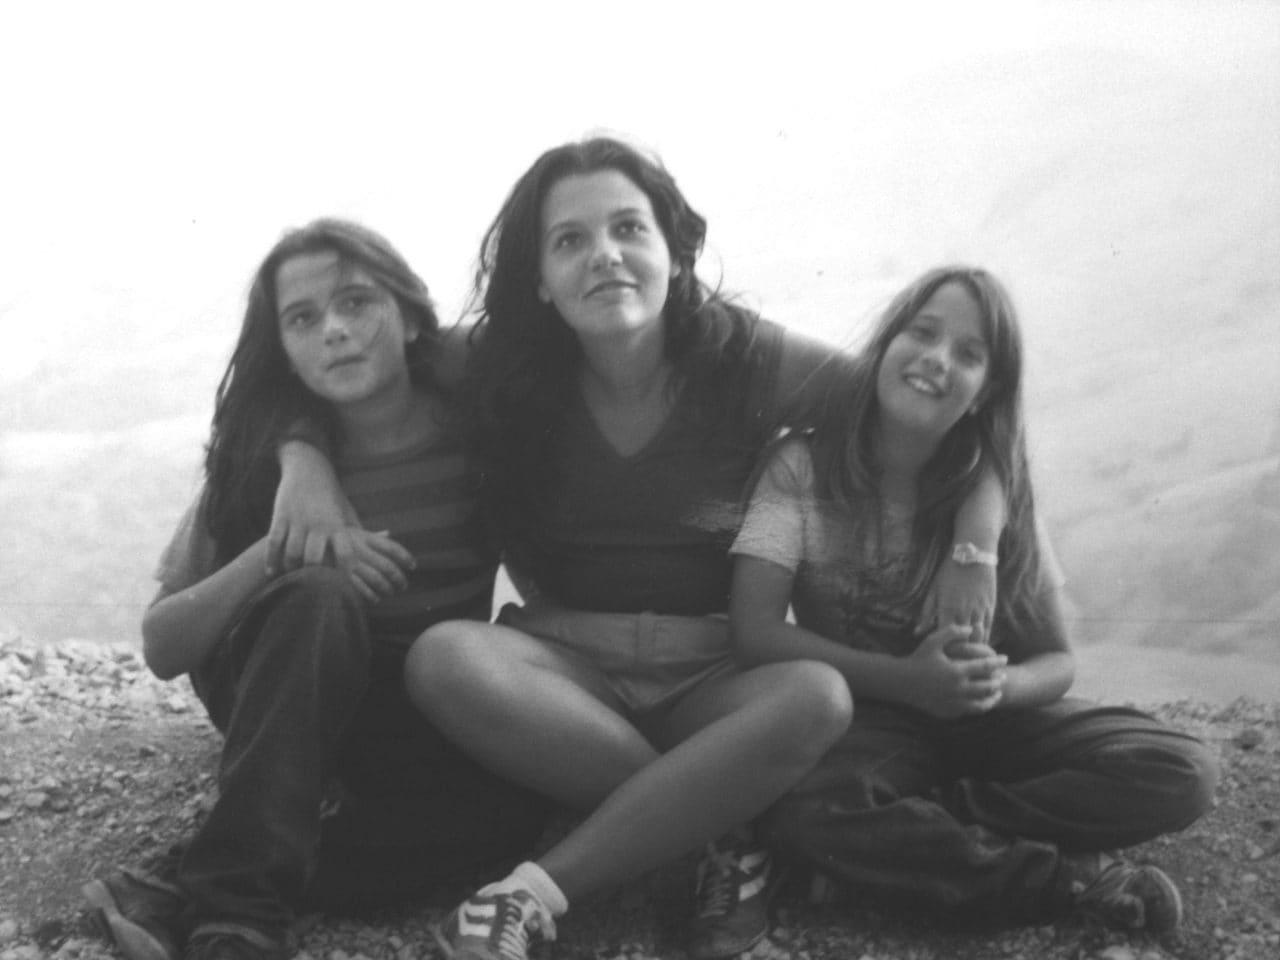 Emanuela a sinistra e Natalina al centro